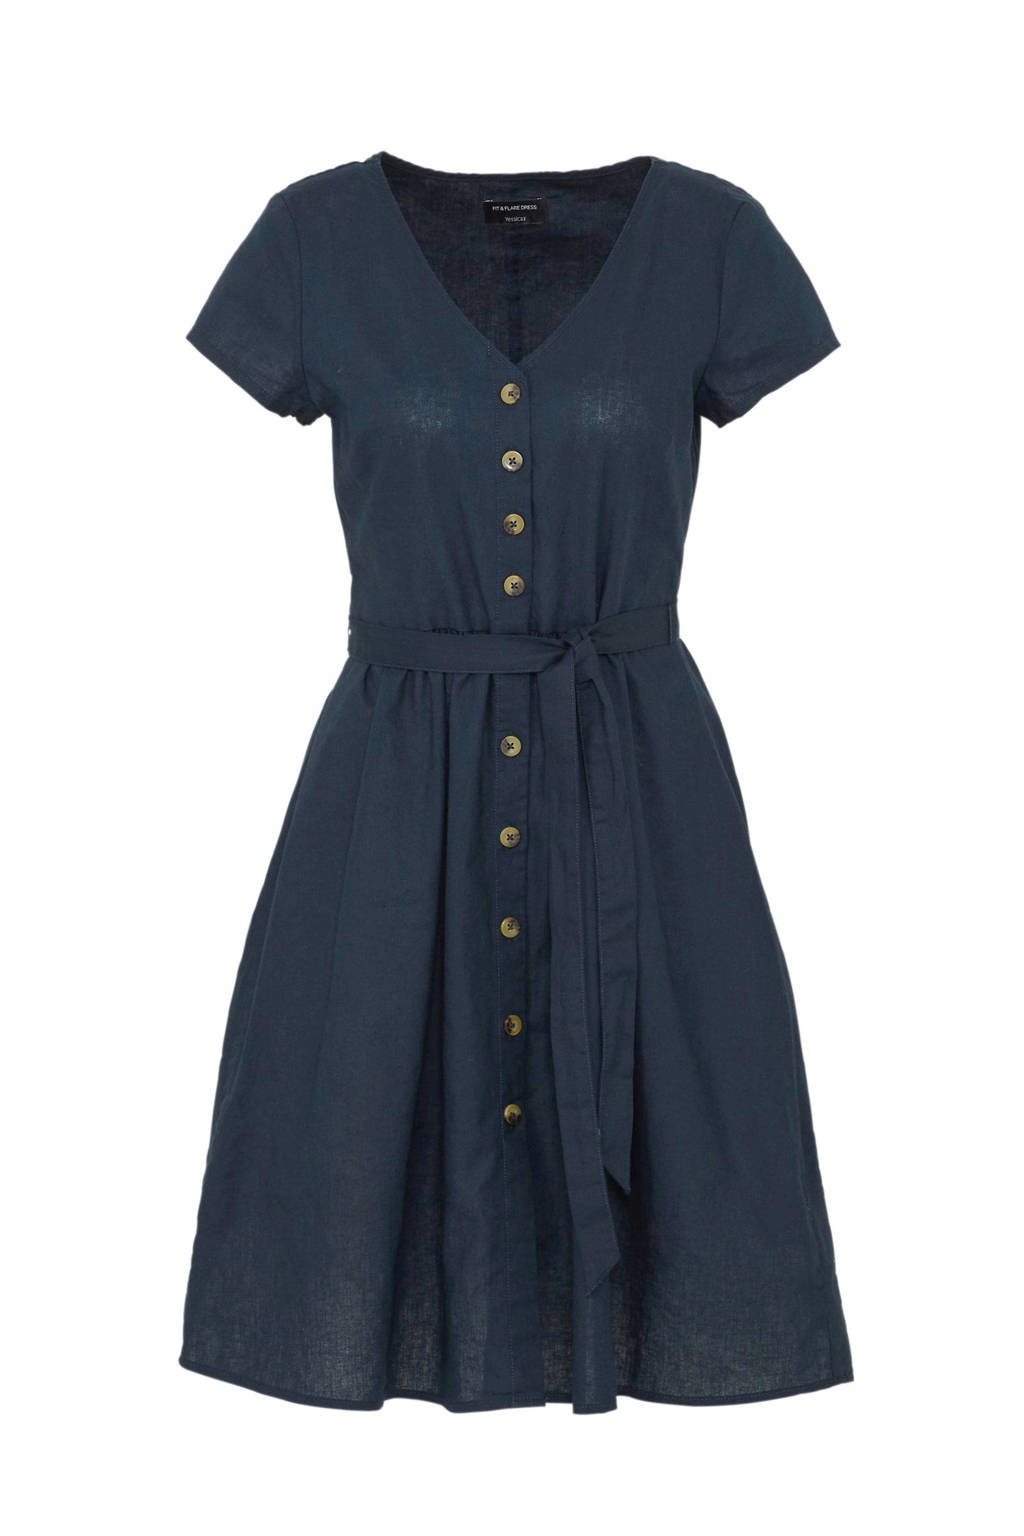 C&A Yessica jurk met knopen donkerblauw, Donkerblauw